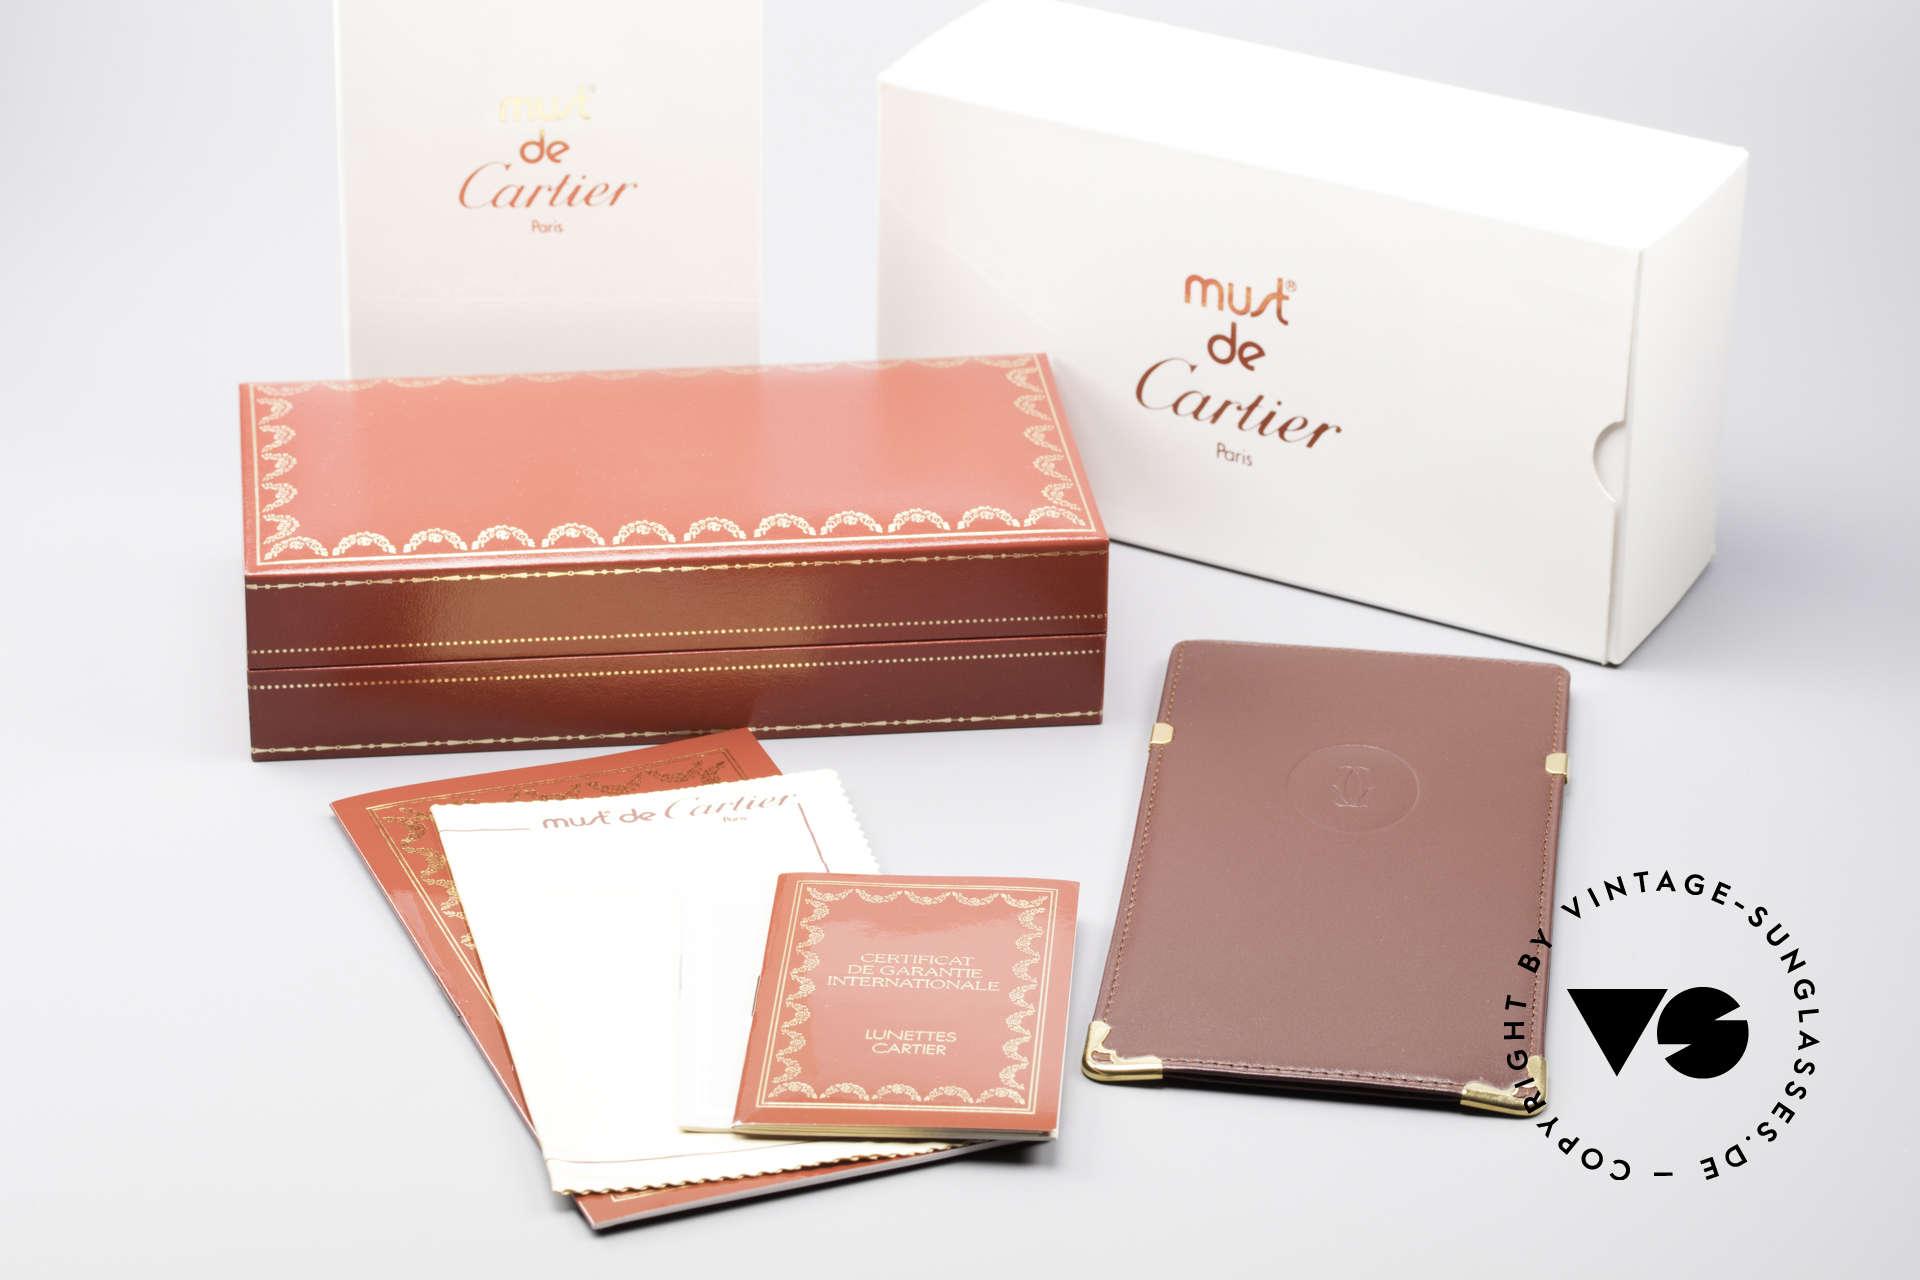 Cartier Vendome LC - M Precious Palladium Finish, Size: medium, Made for Men